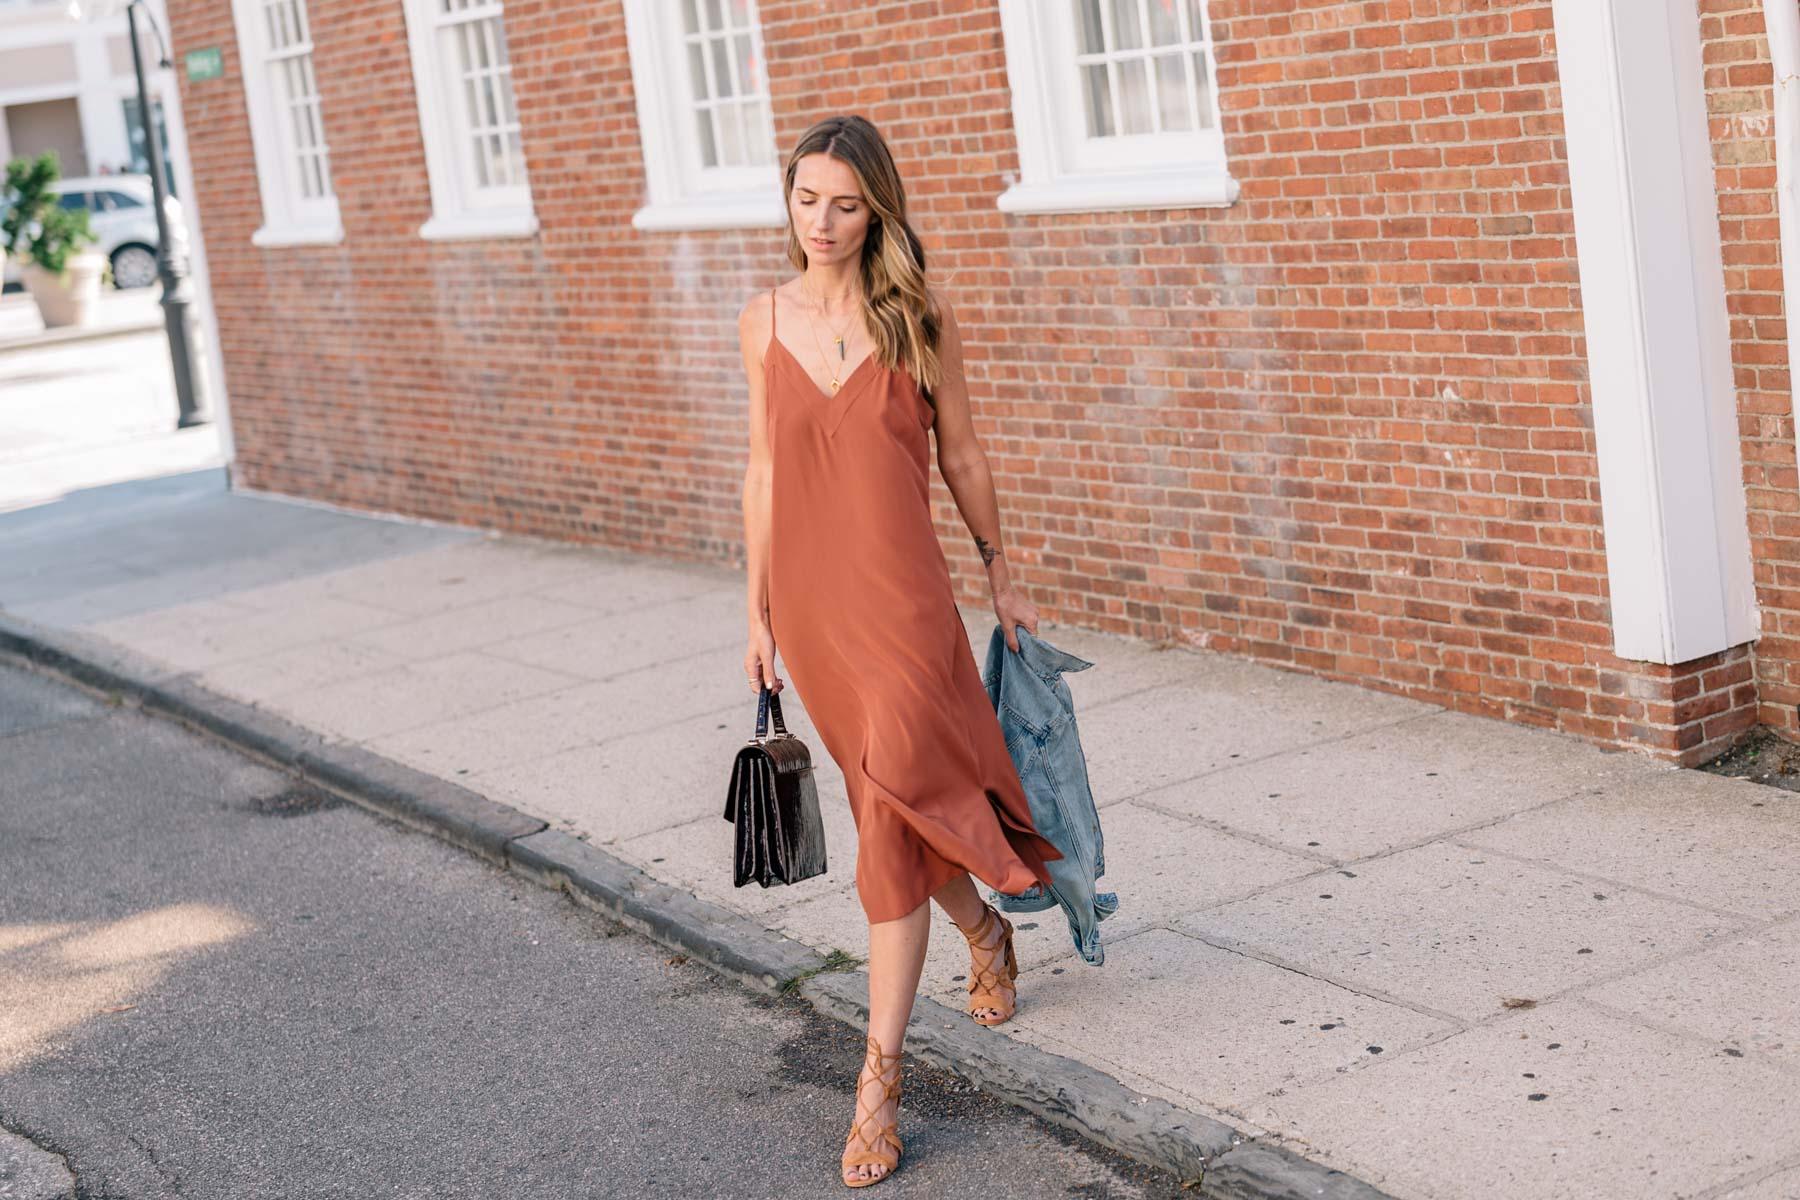 Jess-Ann-Kirby-cuyana-silk-slip-dress-levis-denim-jacket